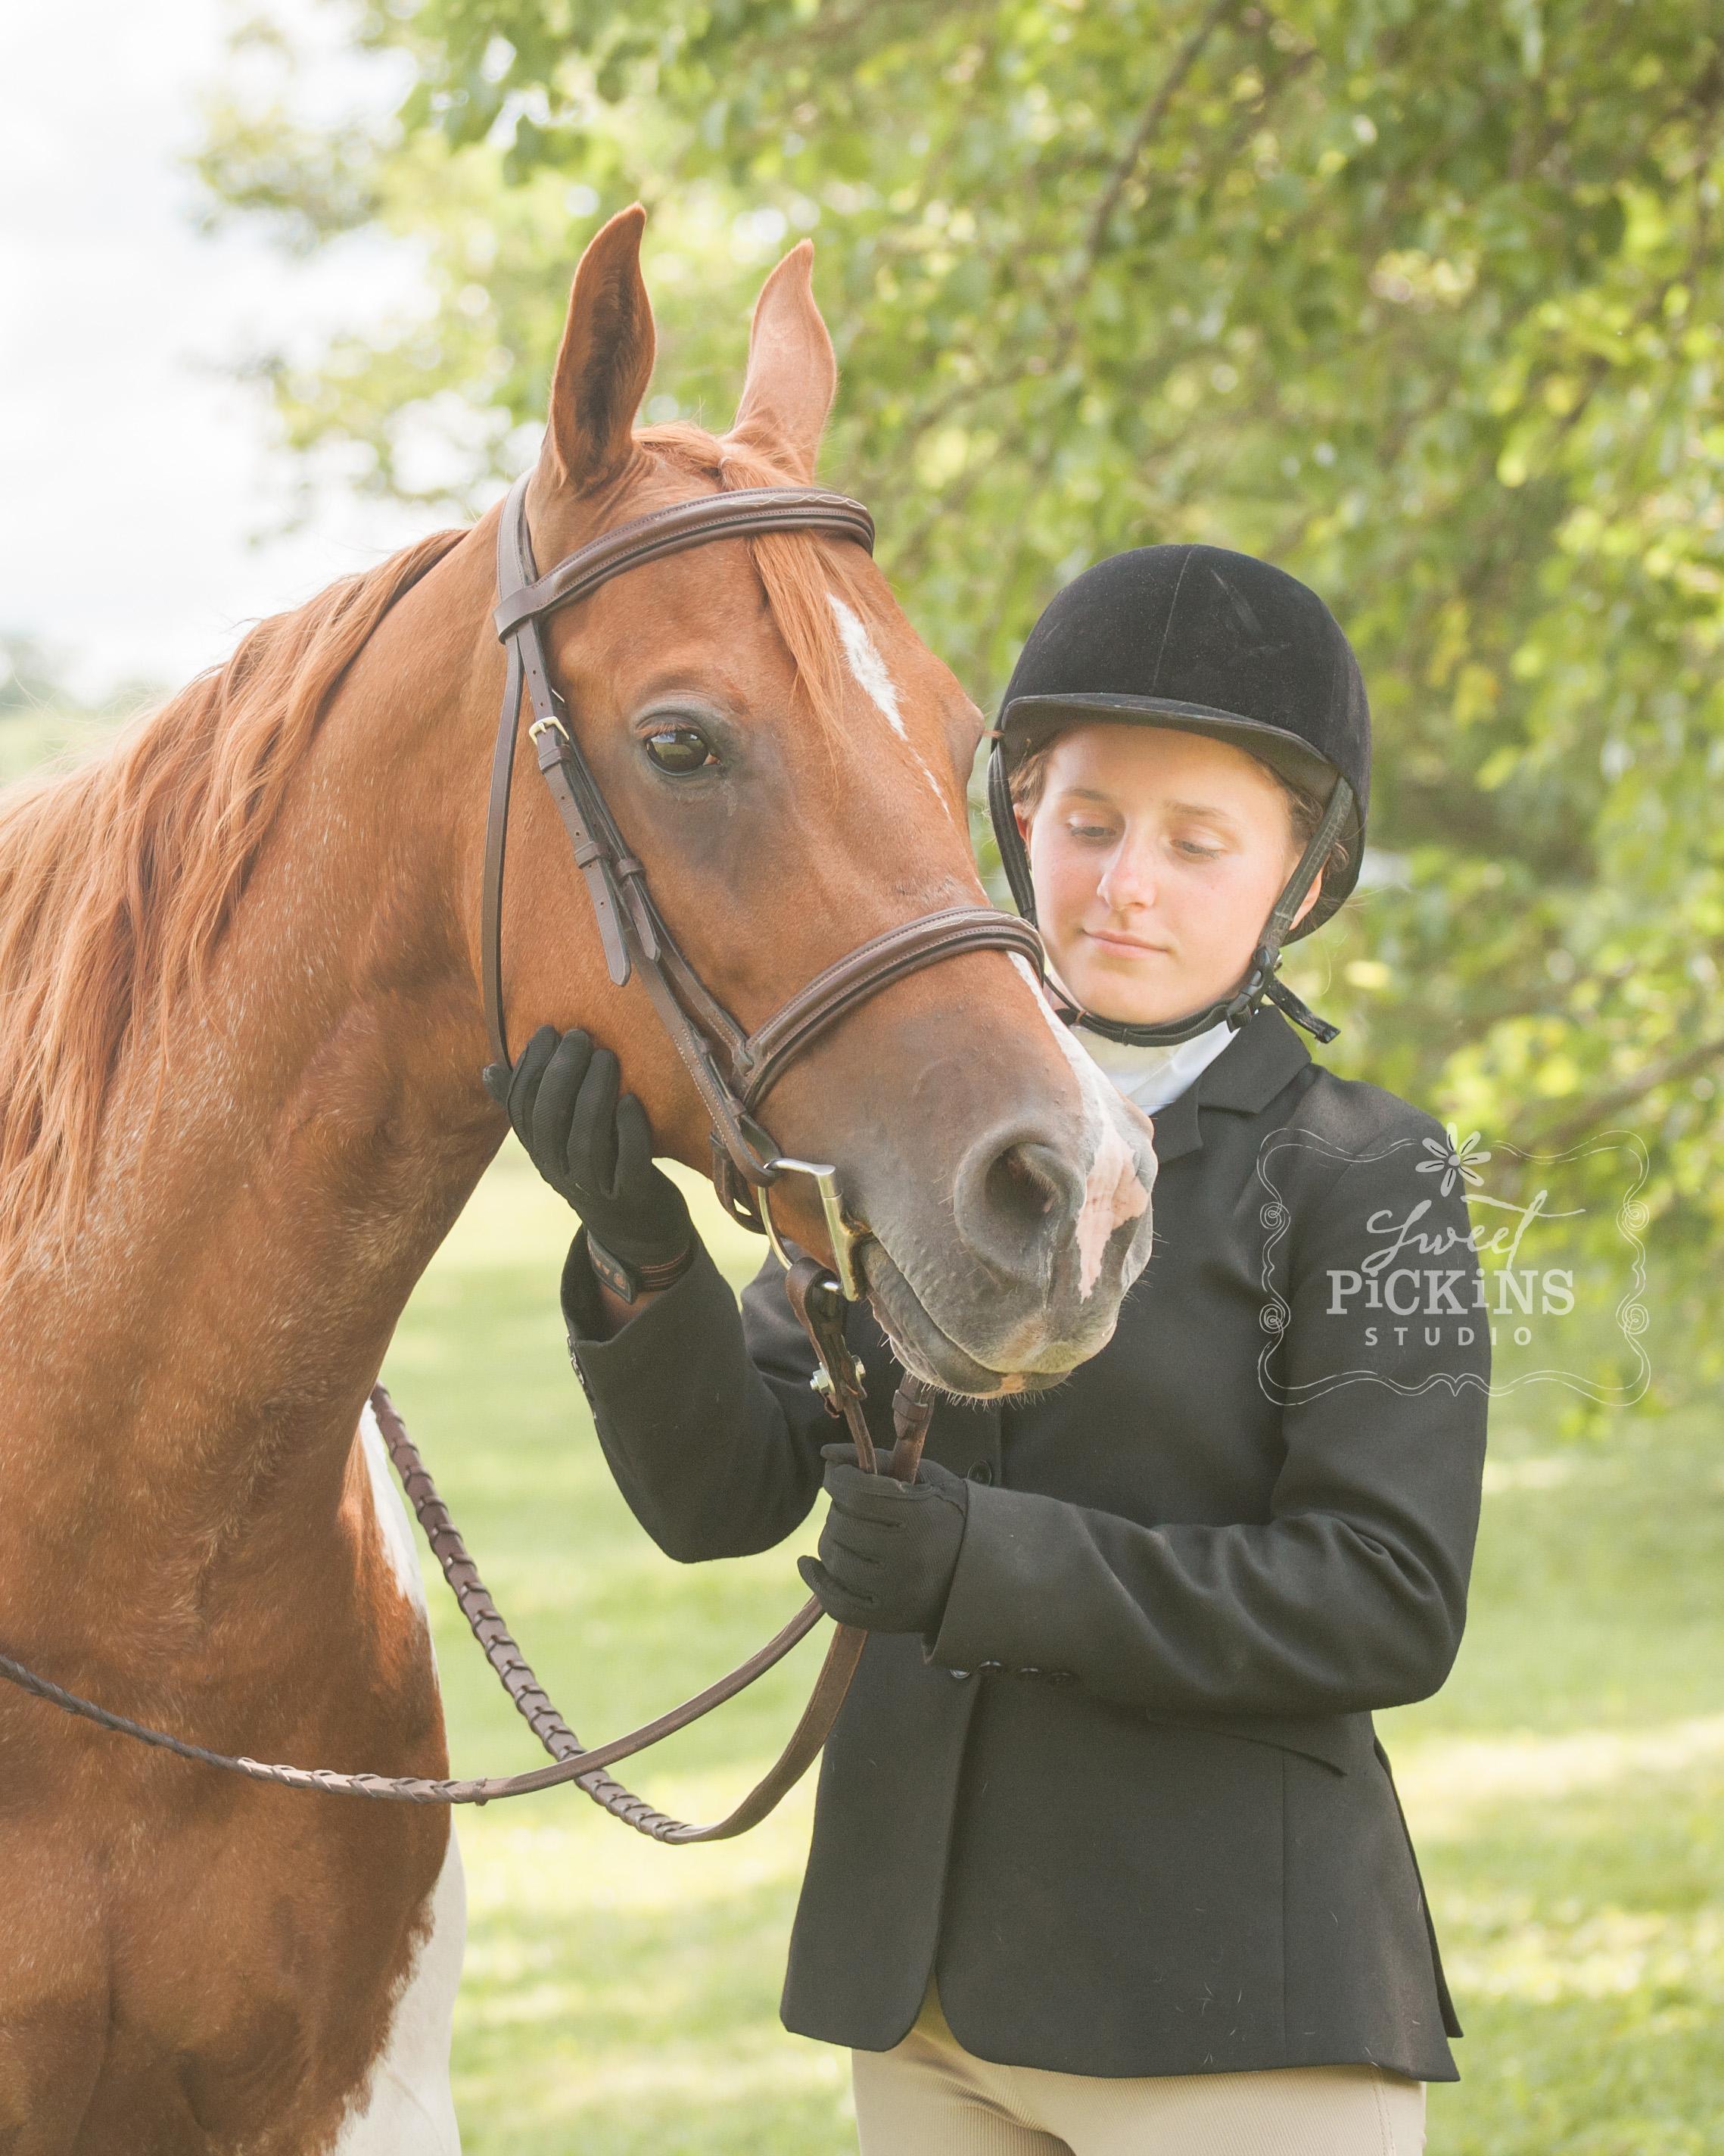 Horse Show Mini Portrait Photography Session   Sweet Pickins Studio